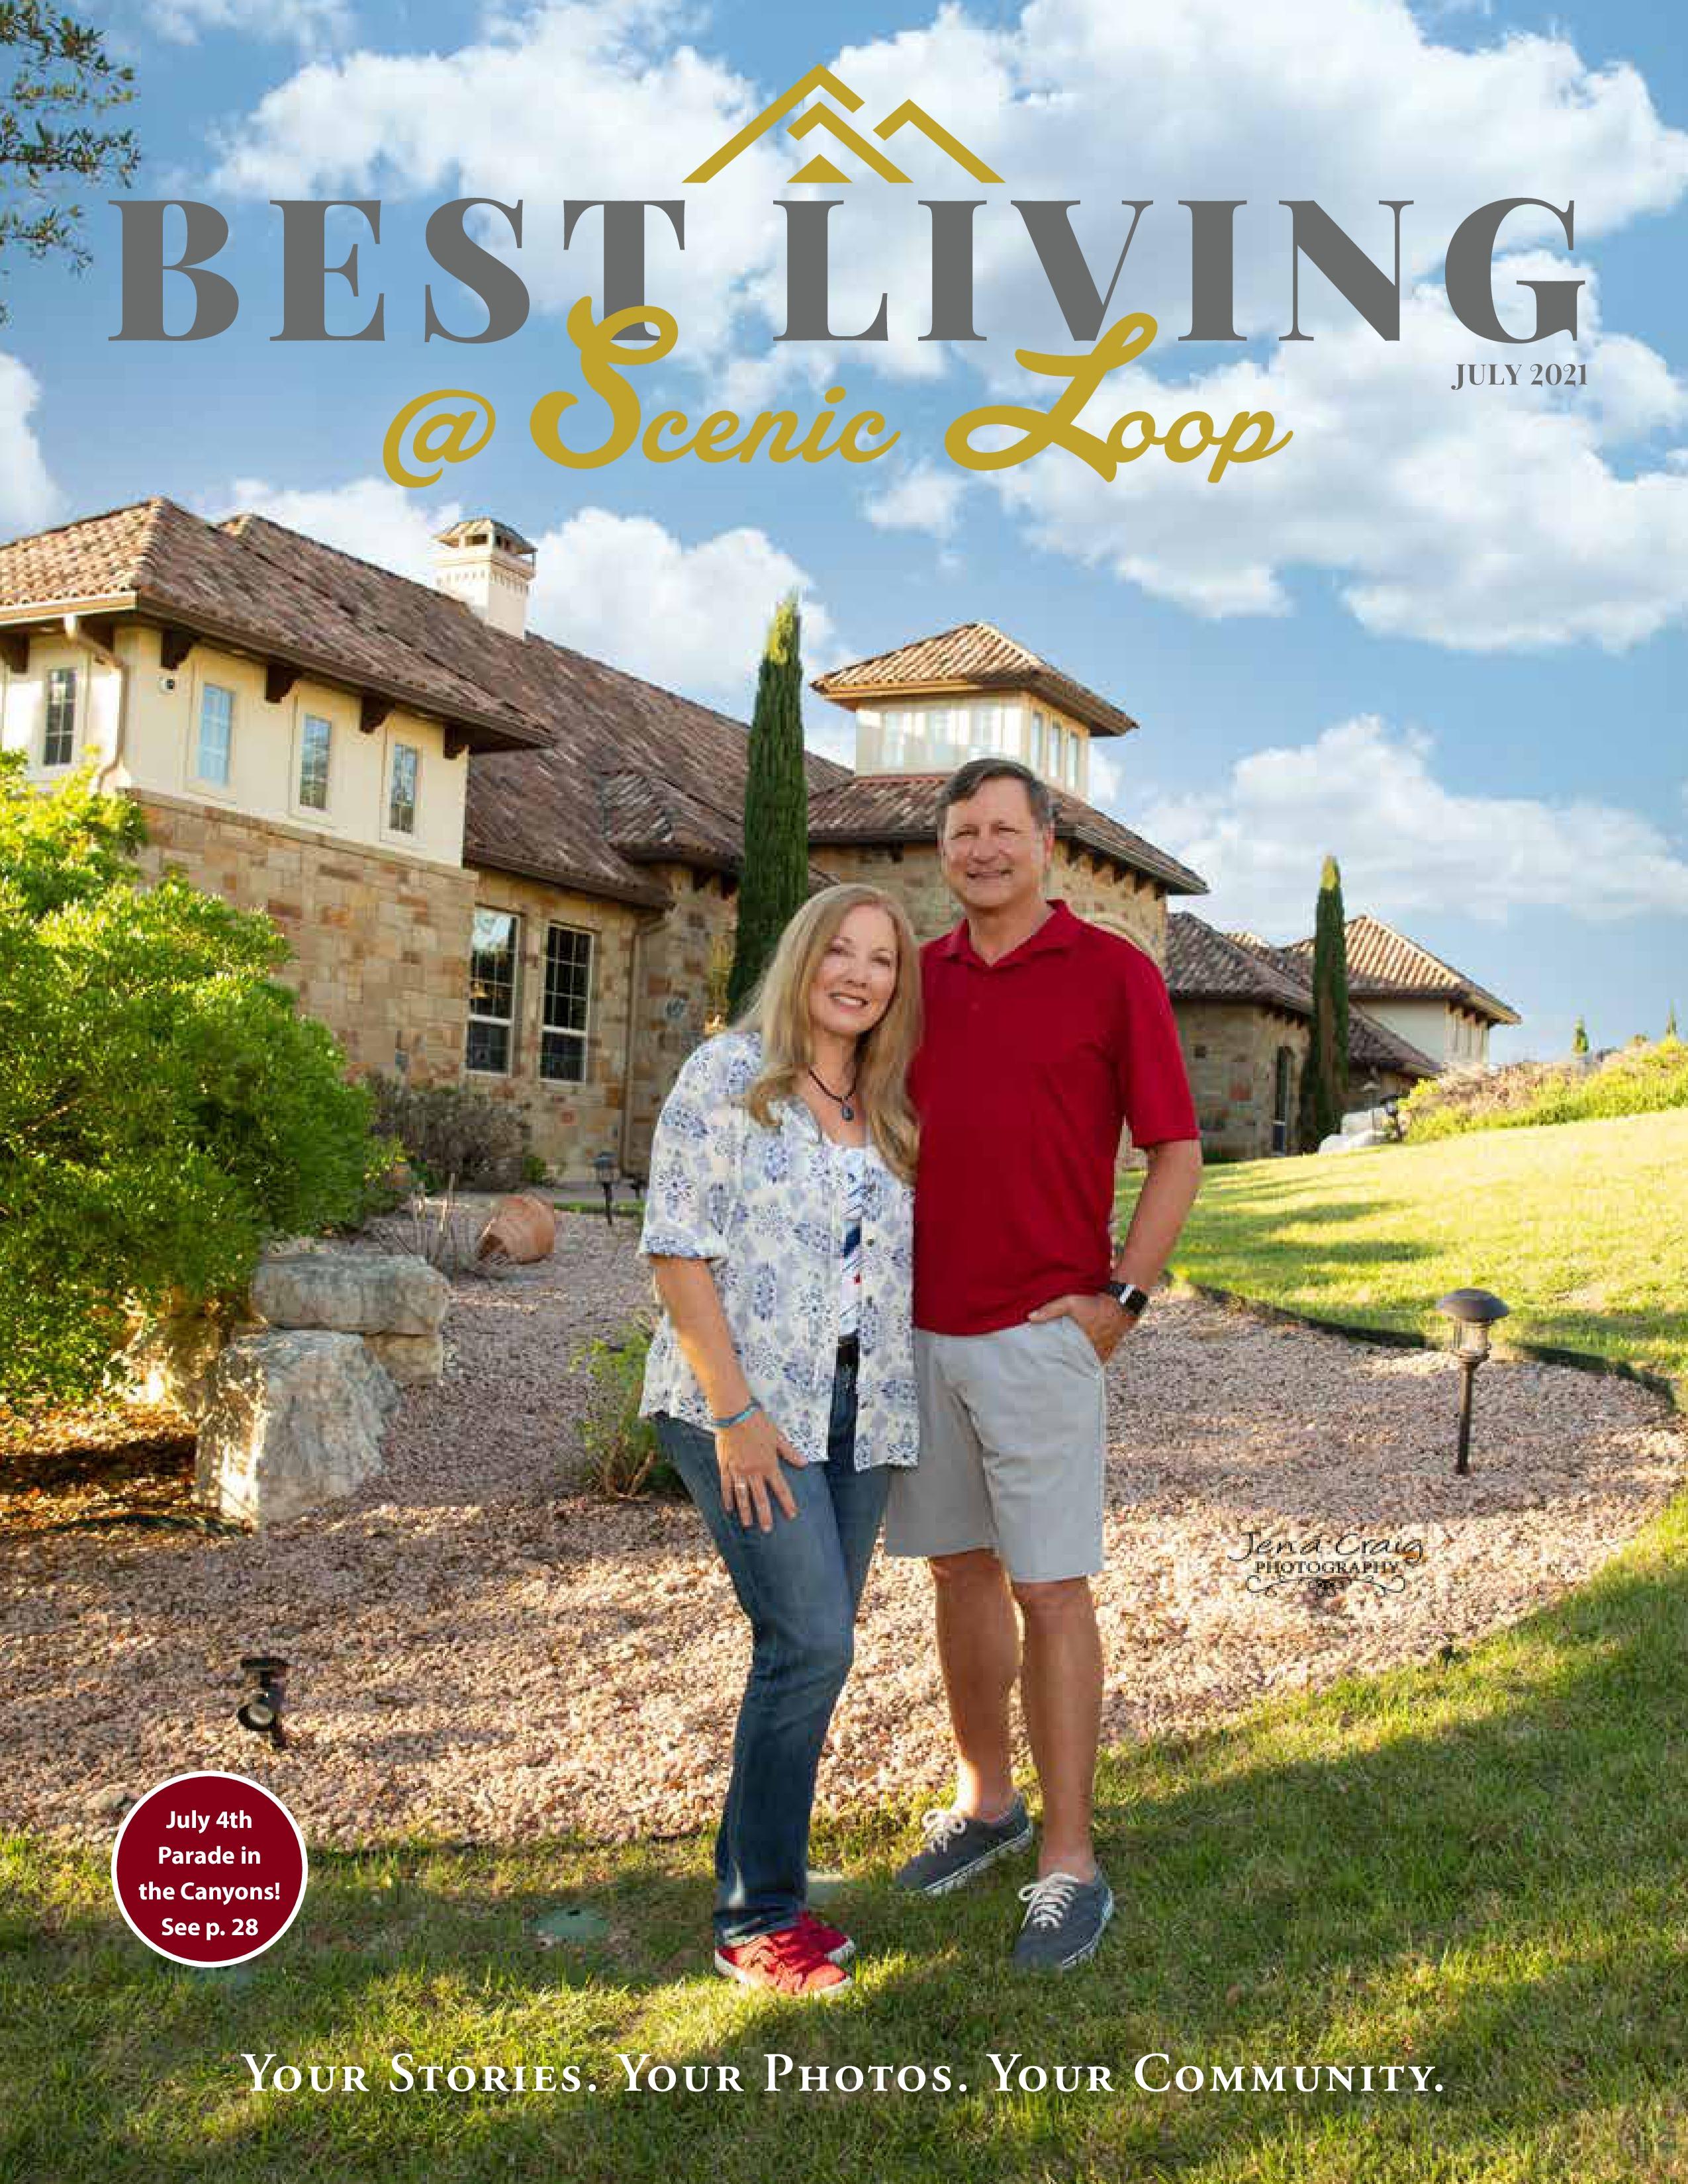 Best Living at Scenic Loop 2021-07-01